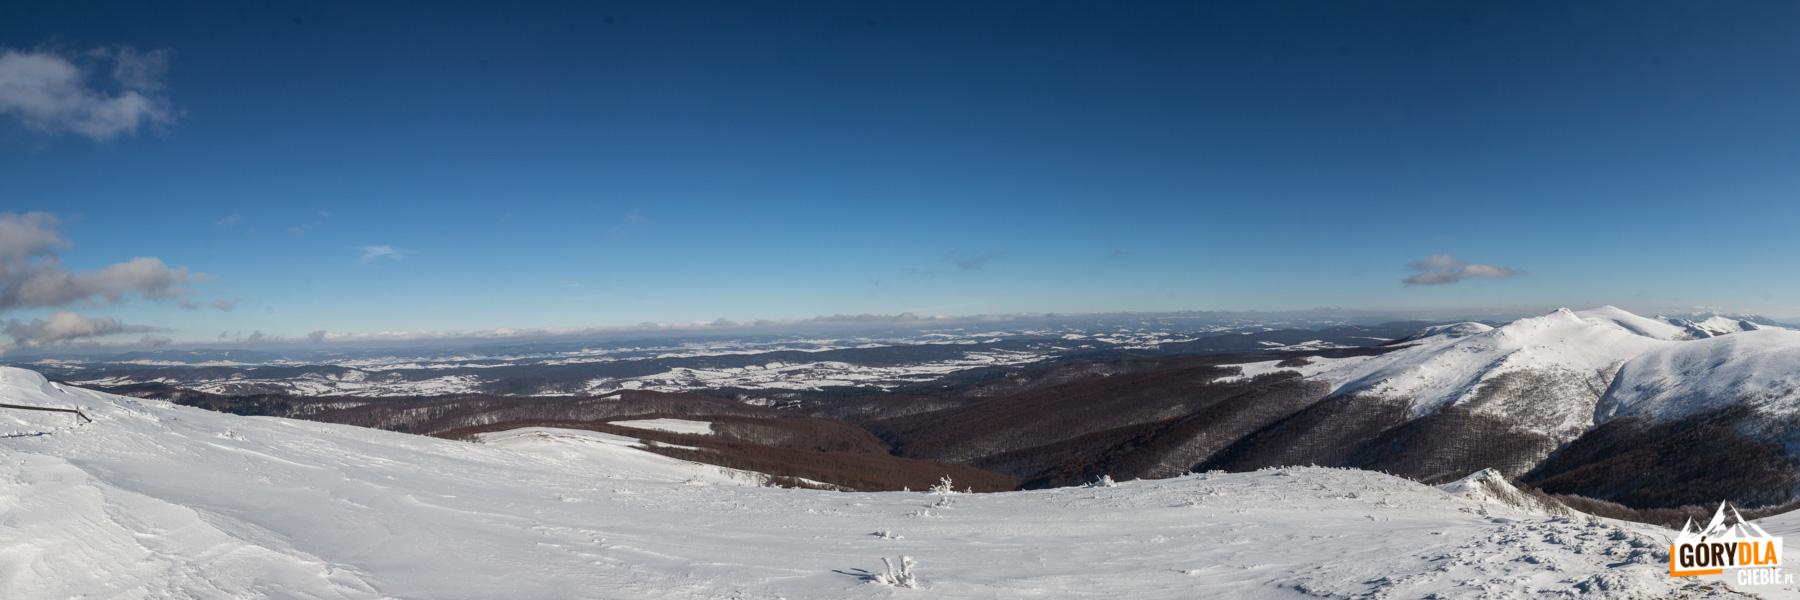 Widoki ze szczytu Bukowego Berda na Bieszczadzki Worek